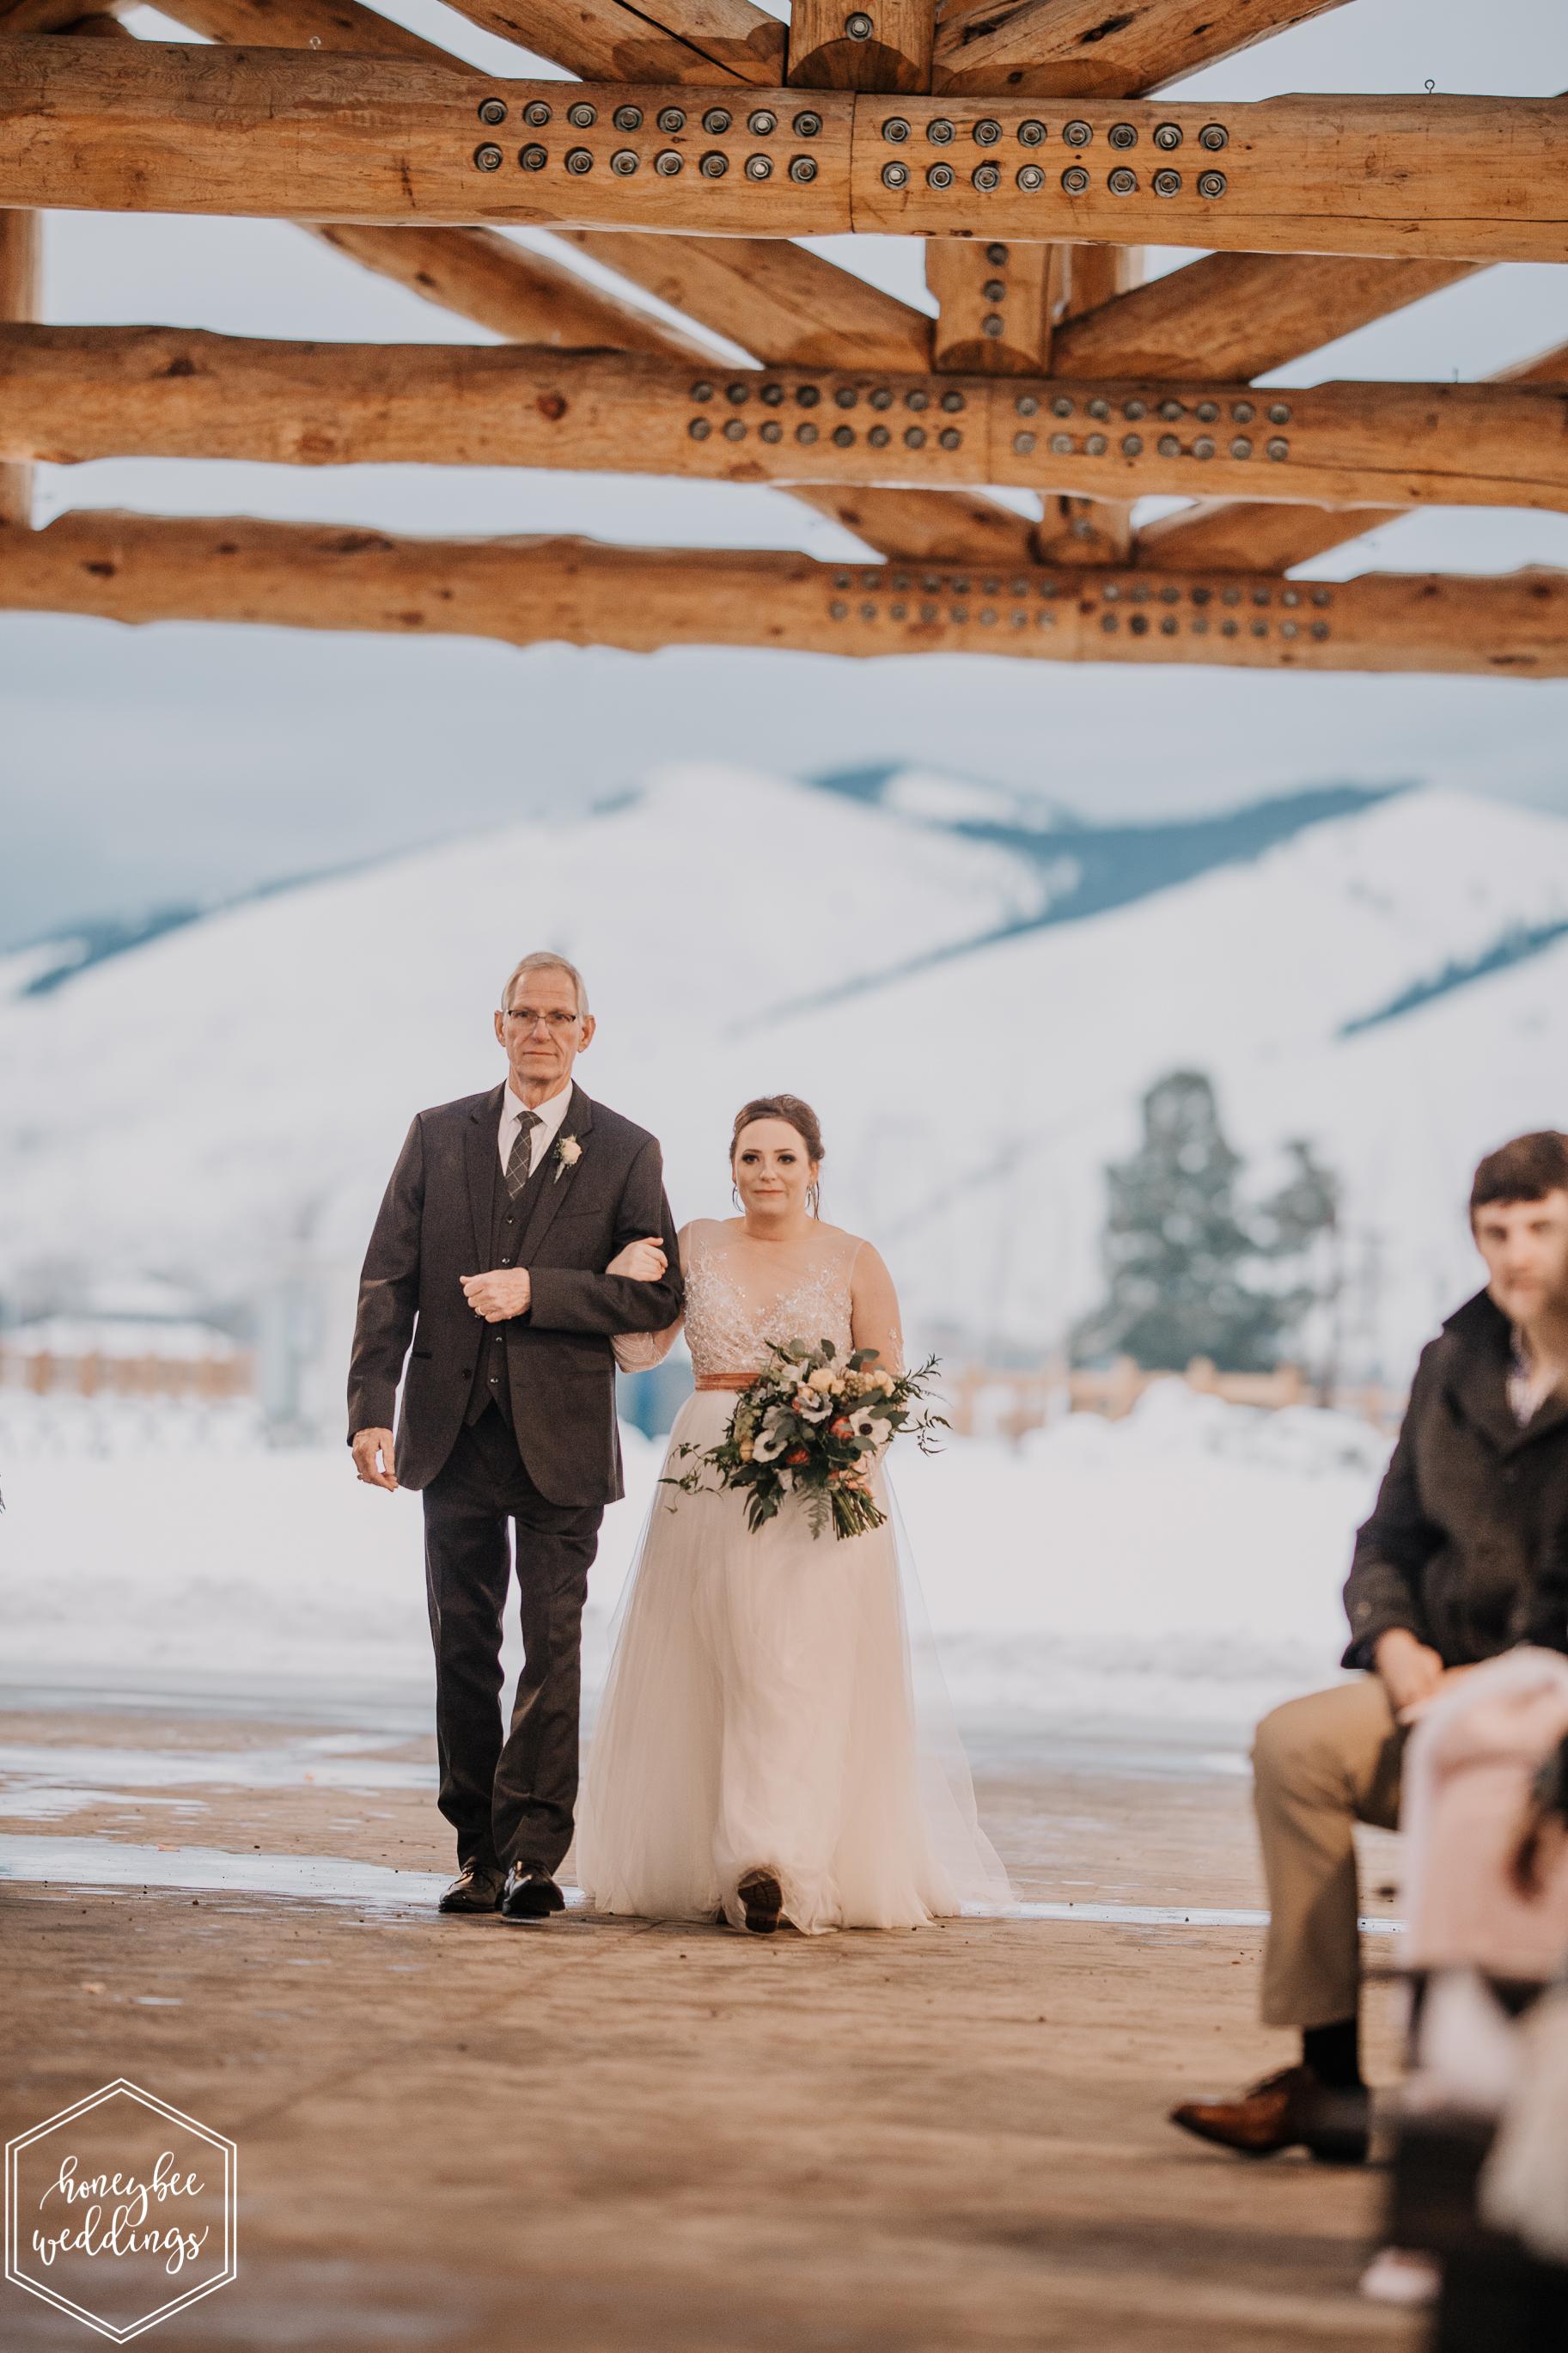 0232Montana Wedding Photographer_Montana winter wedding_Wedding at Fort Missoula_Meri & Carter_December 31, 2015-757.jpg